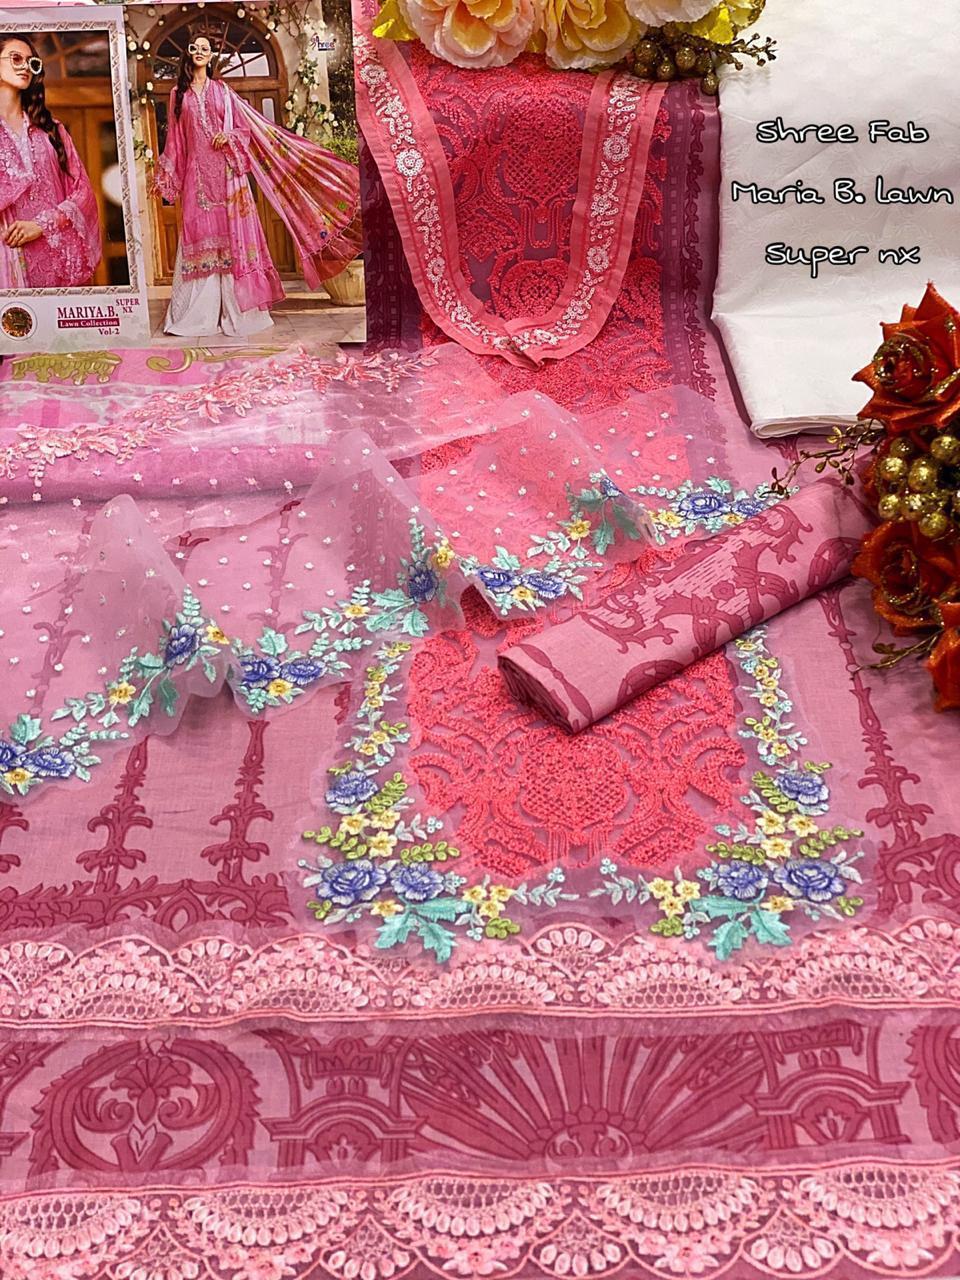 Shree Fab Mariya B Superhit Cotton Printed Embroidery Work Suits In Single